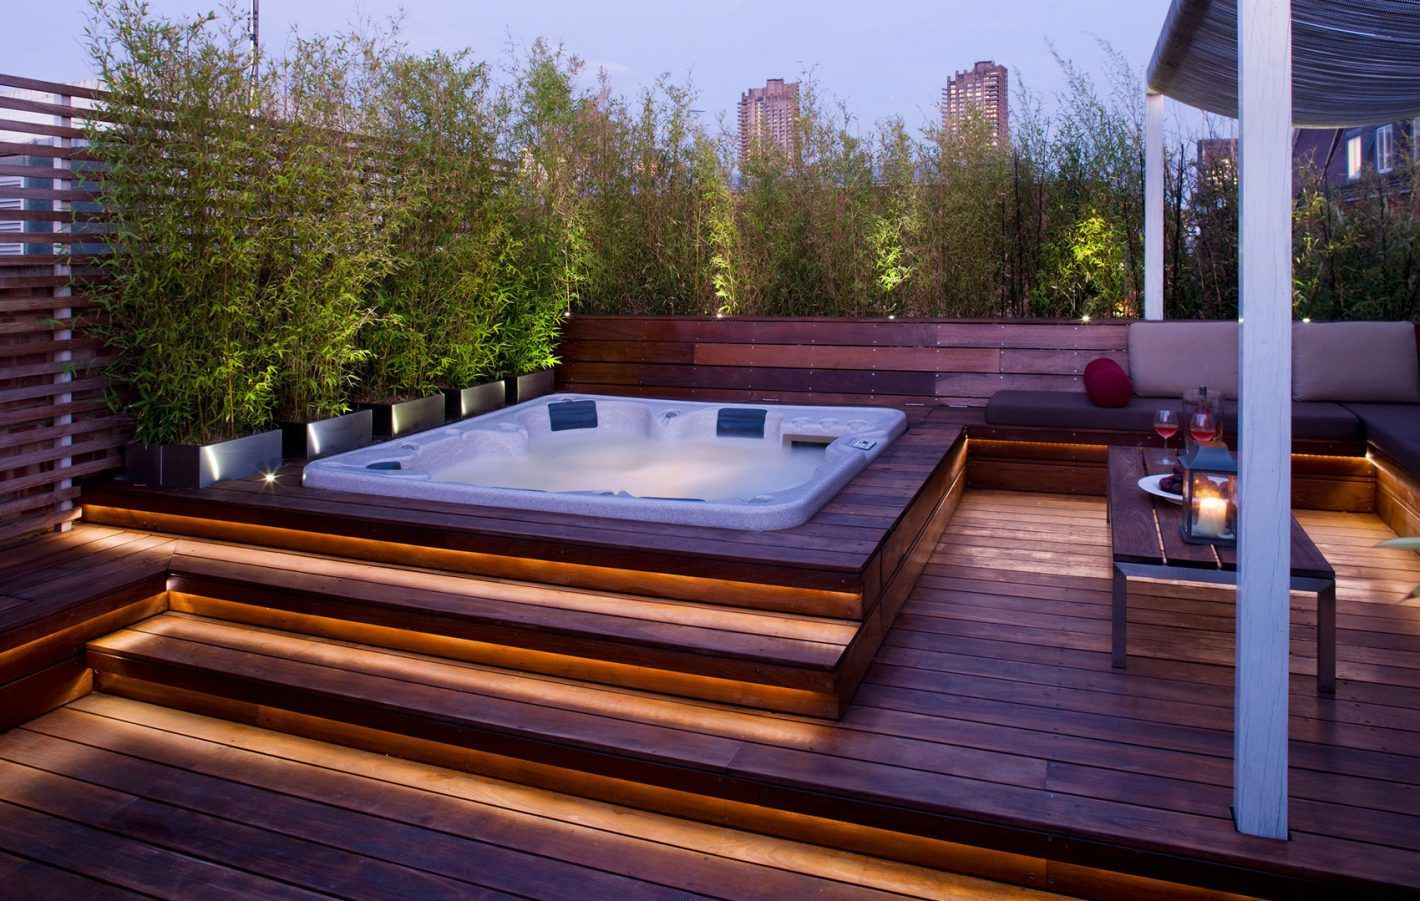 deck lighting ideas. Hot-tub-deck Love The Deck Lighting, That It Is Built-in Lighting Ideas E